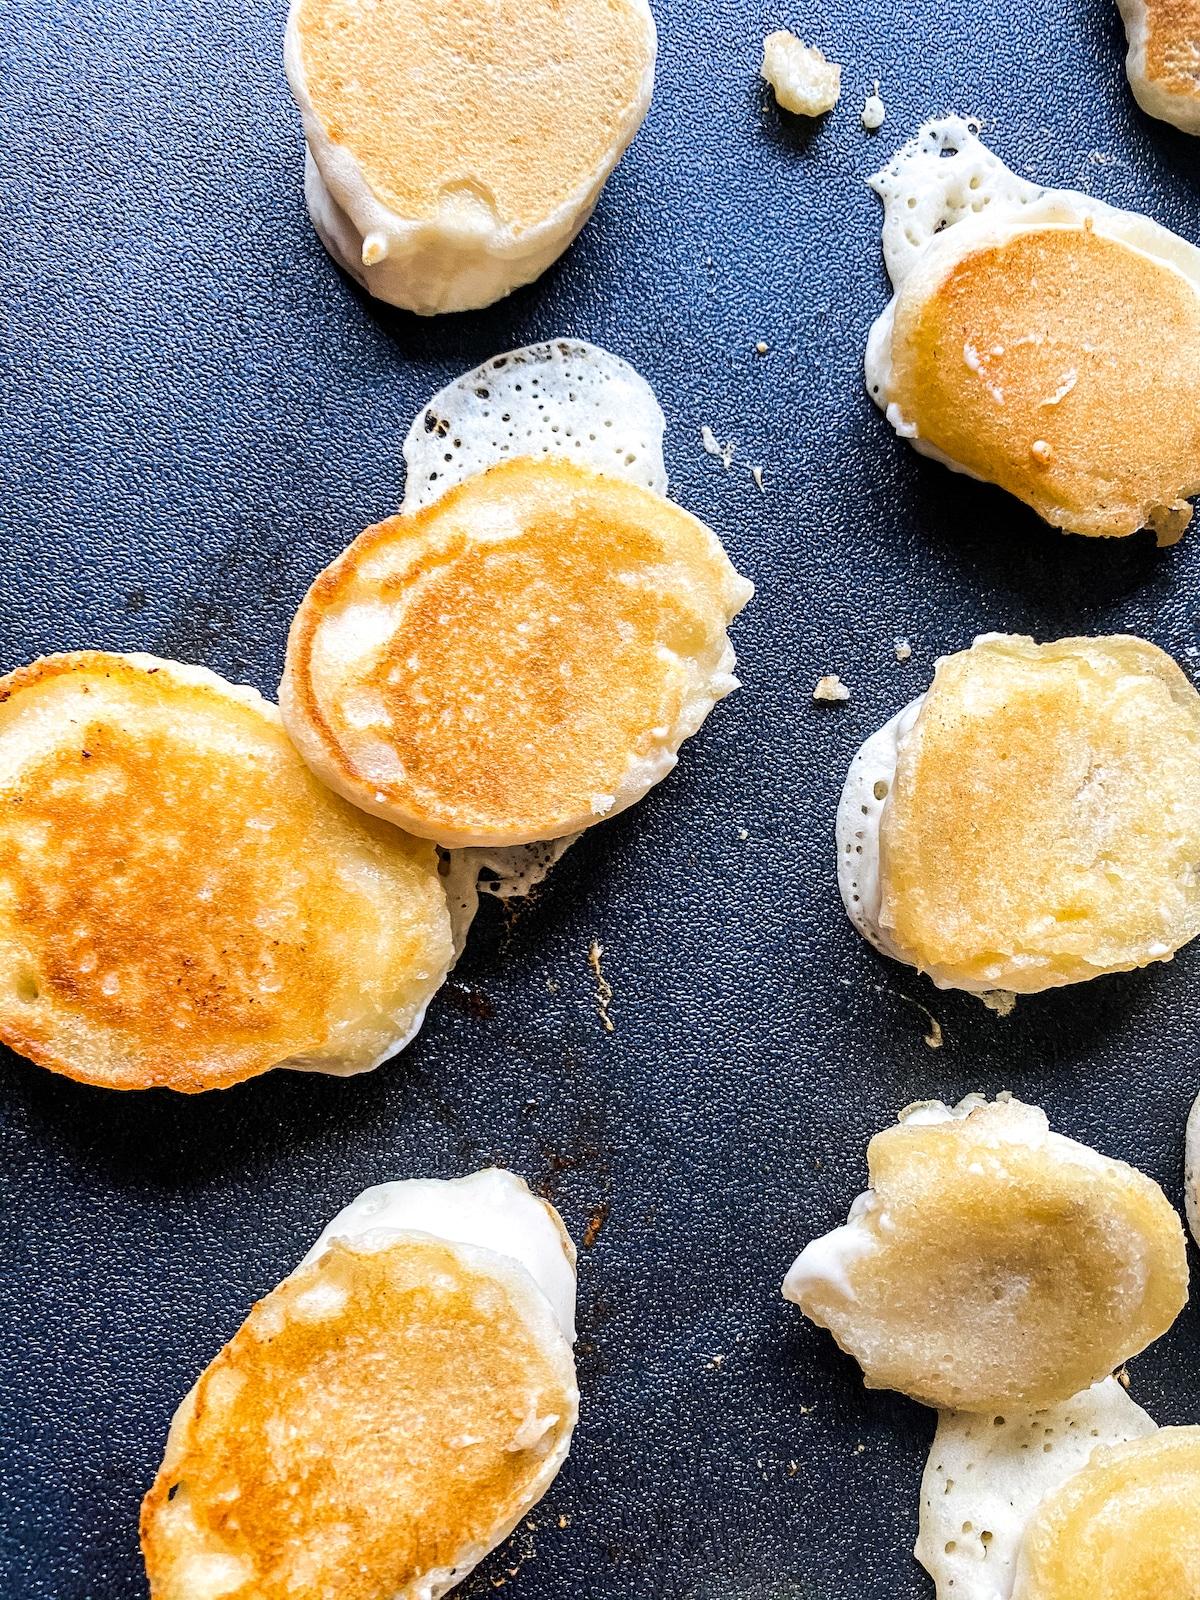 Banana pancake dippers cooking